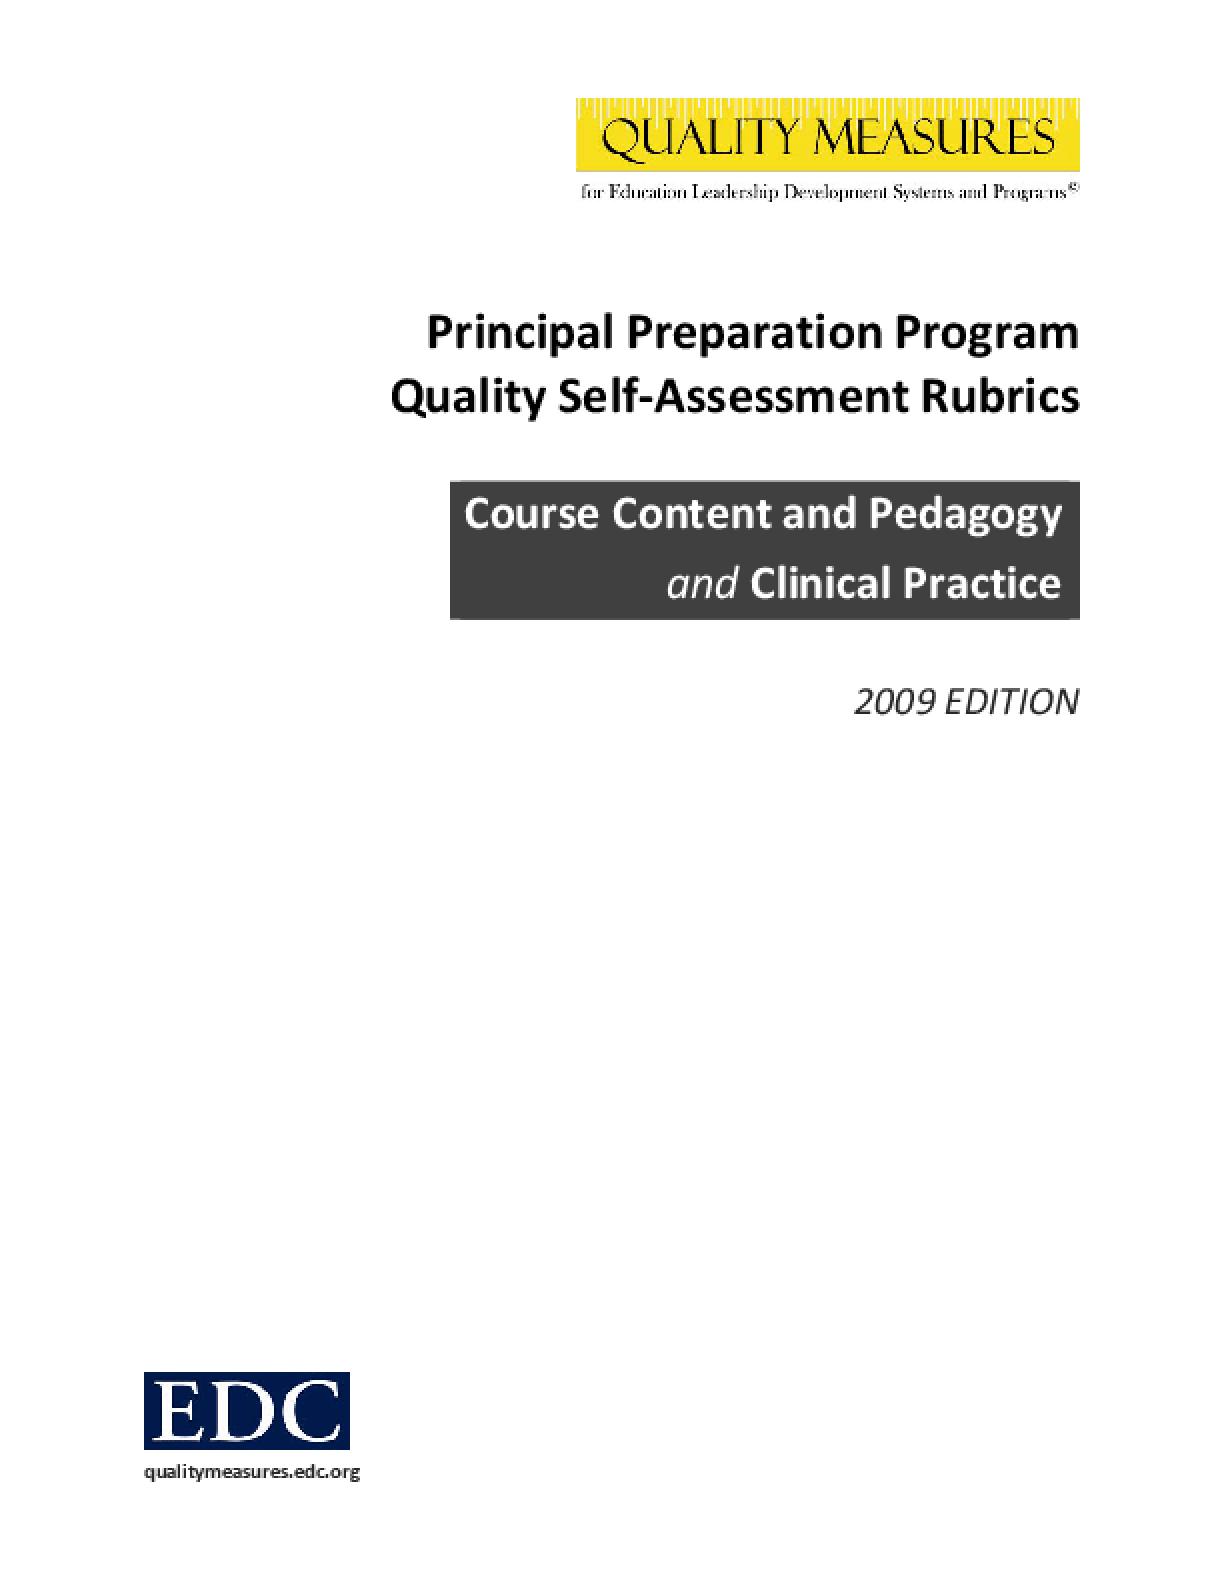 Quality Measures: Principal Preparation Program Assessment